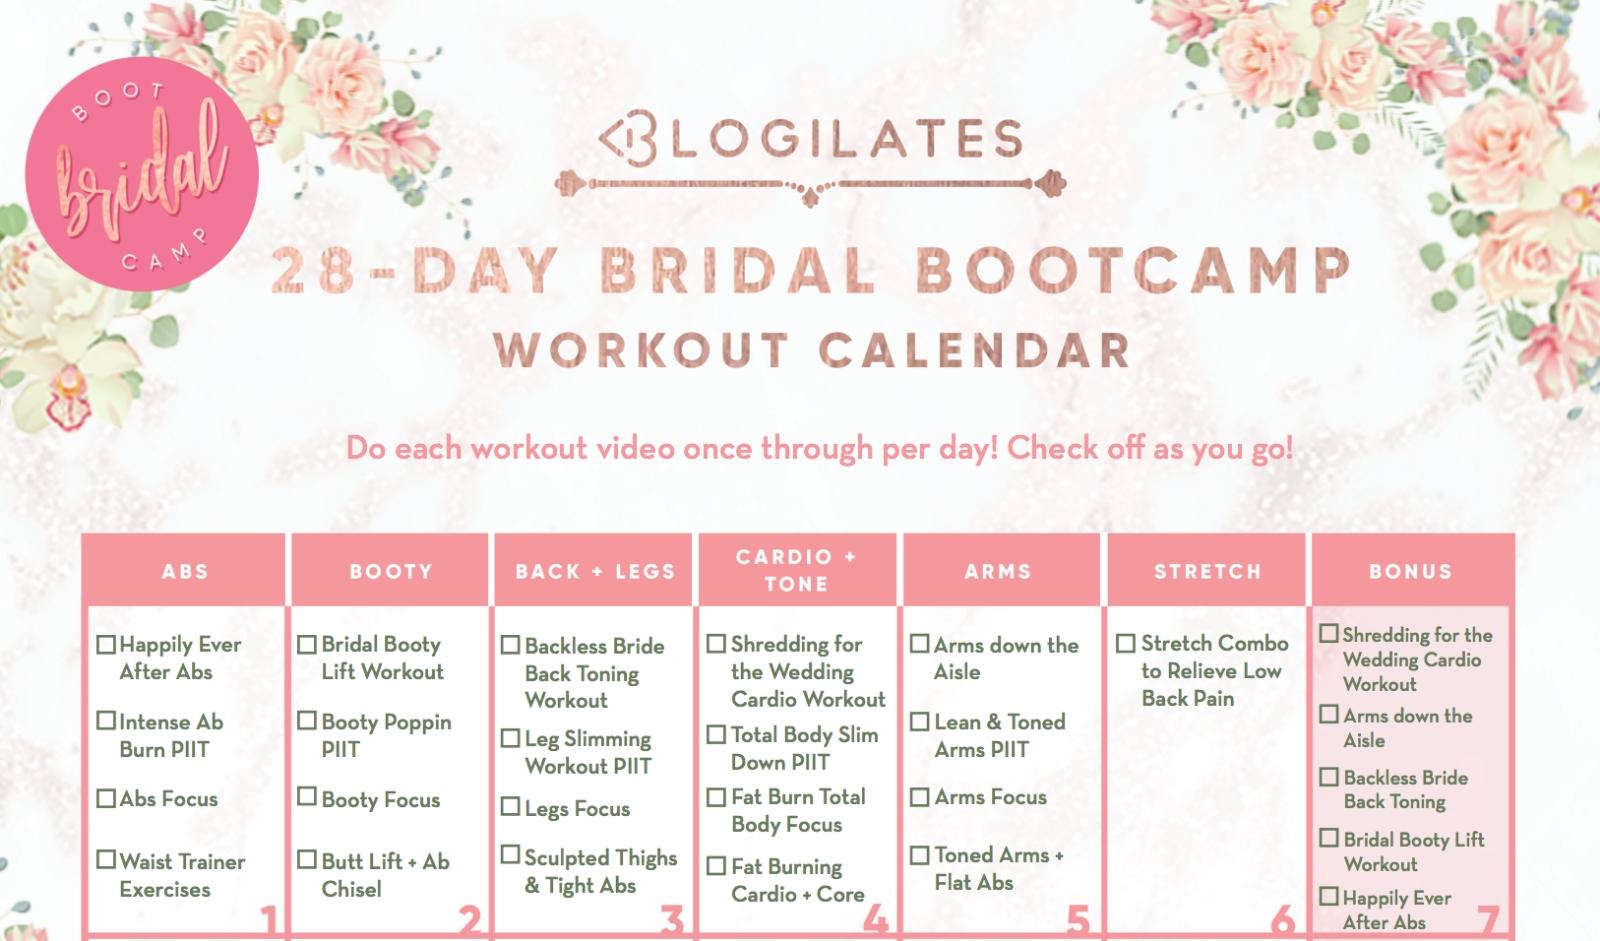 28-Day Bridal Bootcamp Workout Calendar – Blogilates